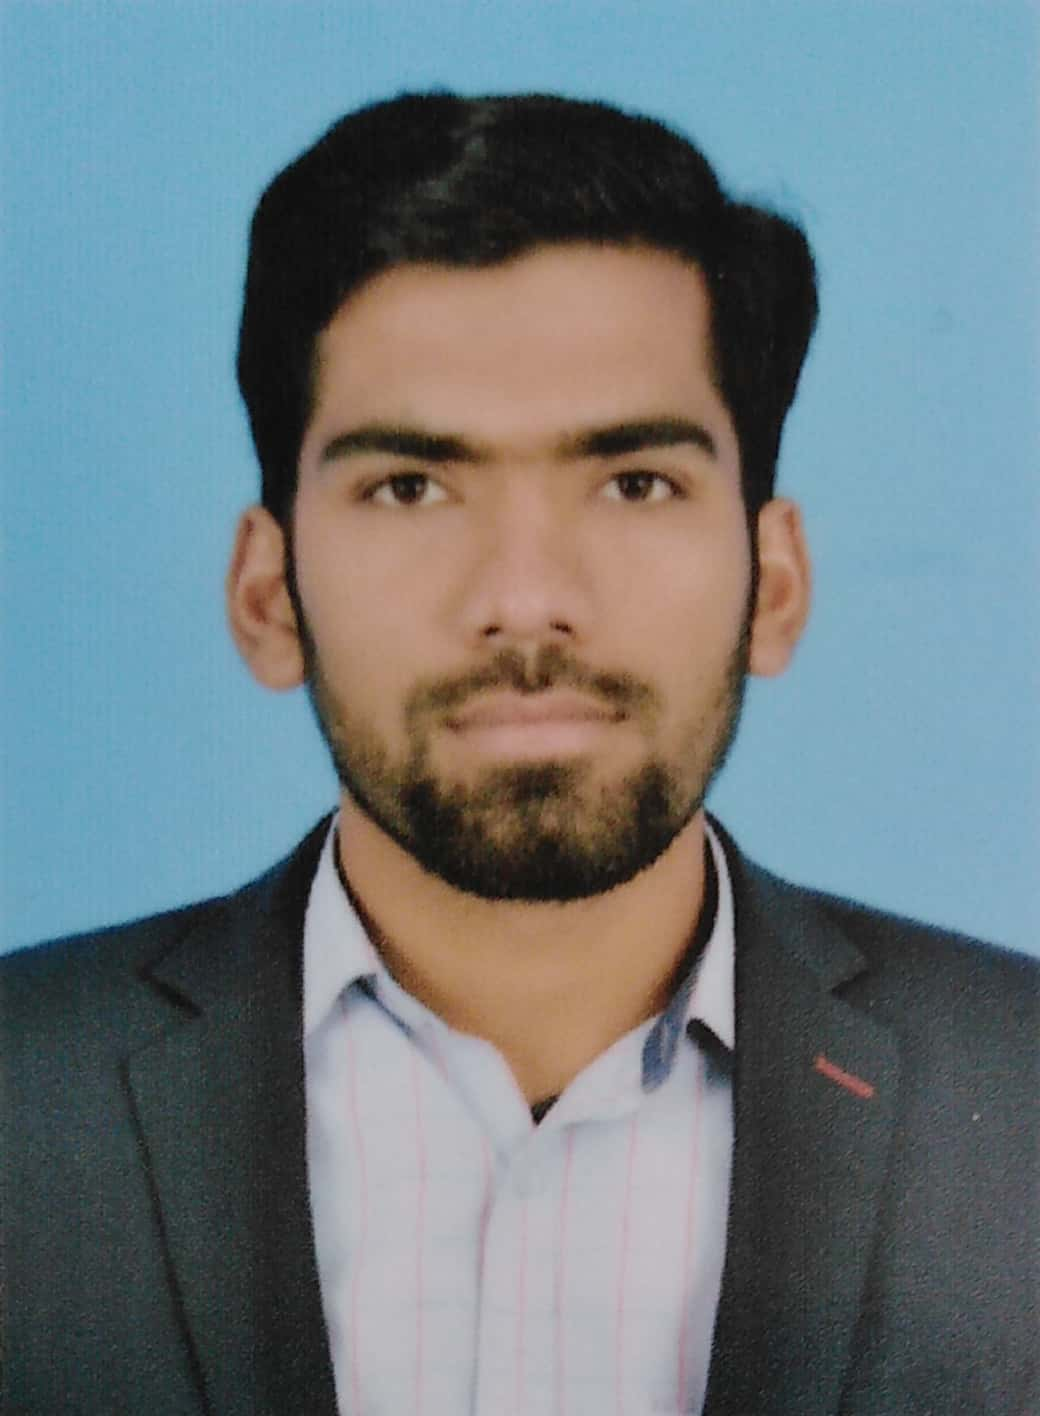 Muhammad Mohsin